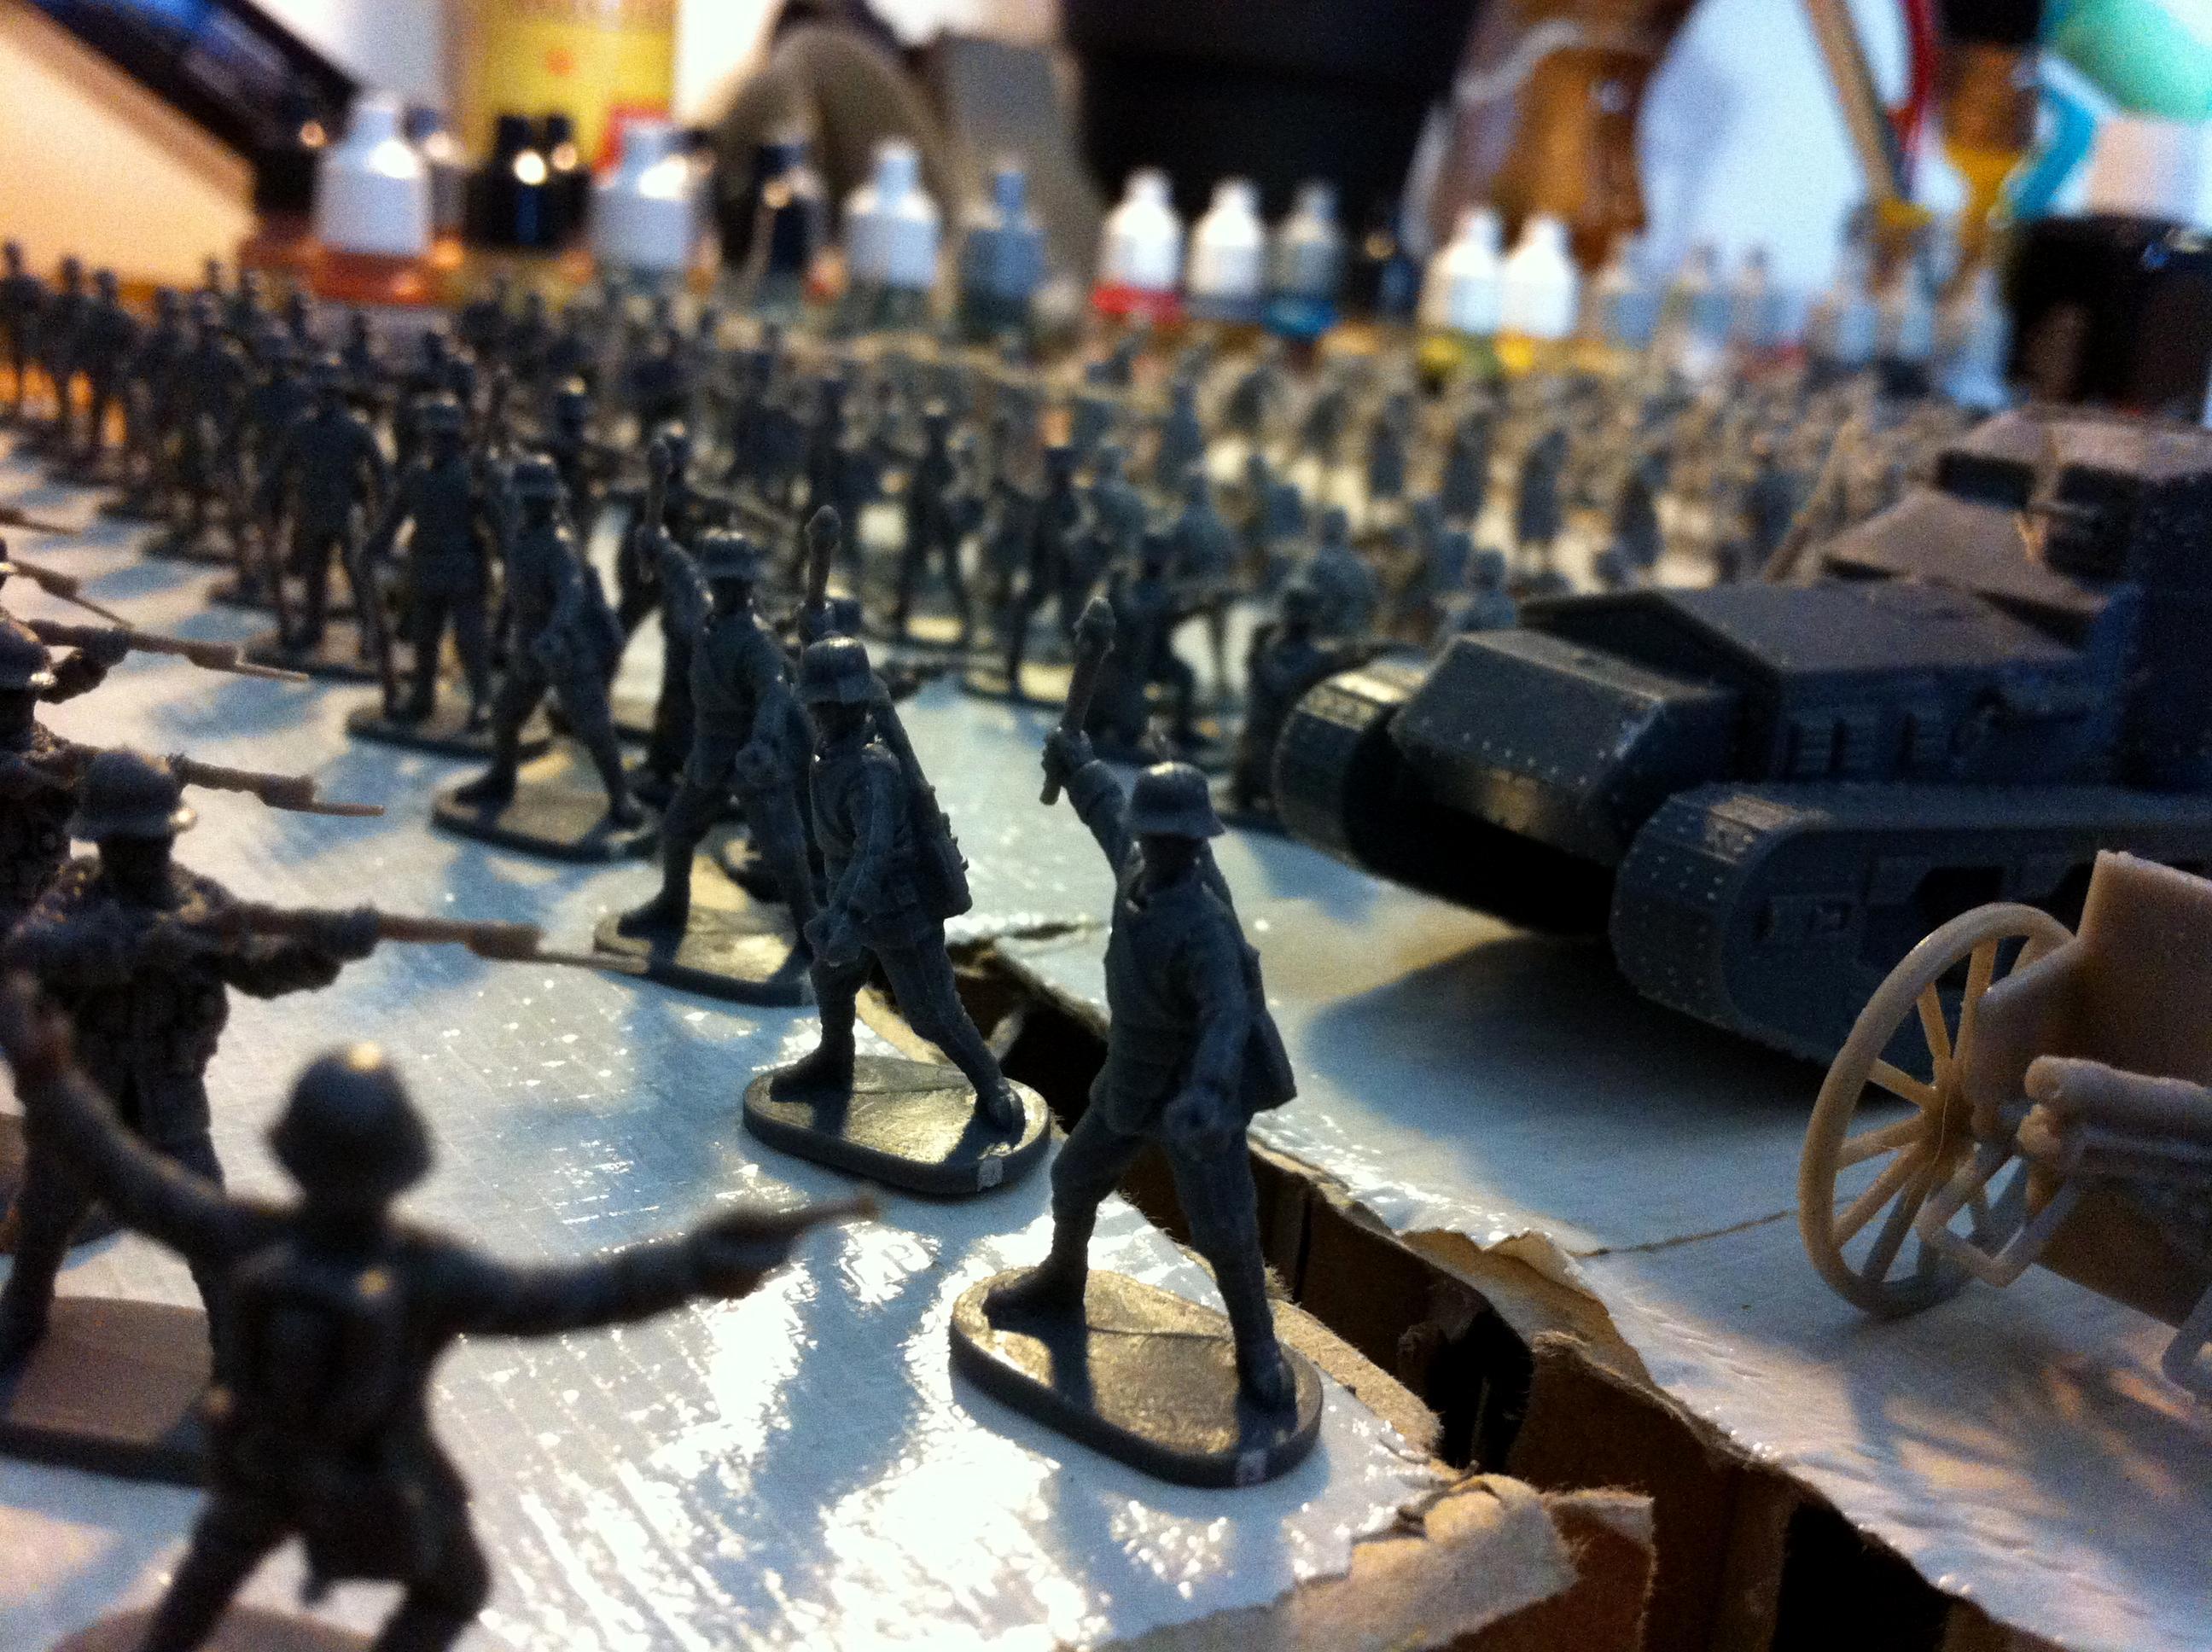 British Artillery, British Infantry, Caesar Miniatures, Ehmar, Figures, French Infantry, German Artillery, German Infantry, Unpainted, Whippet Mka, Wwi, Wwi Diorama